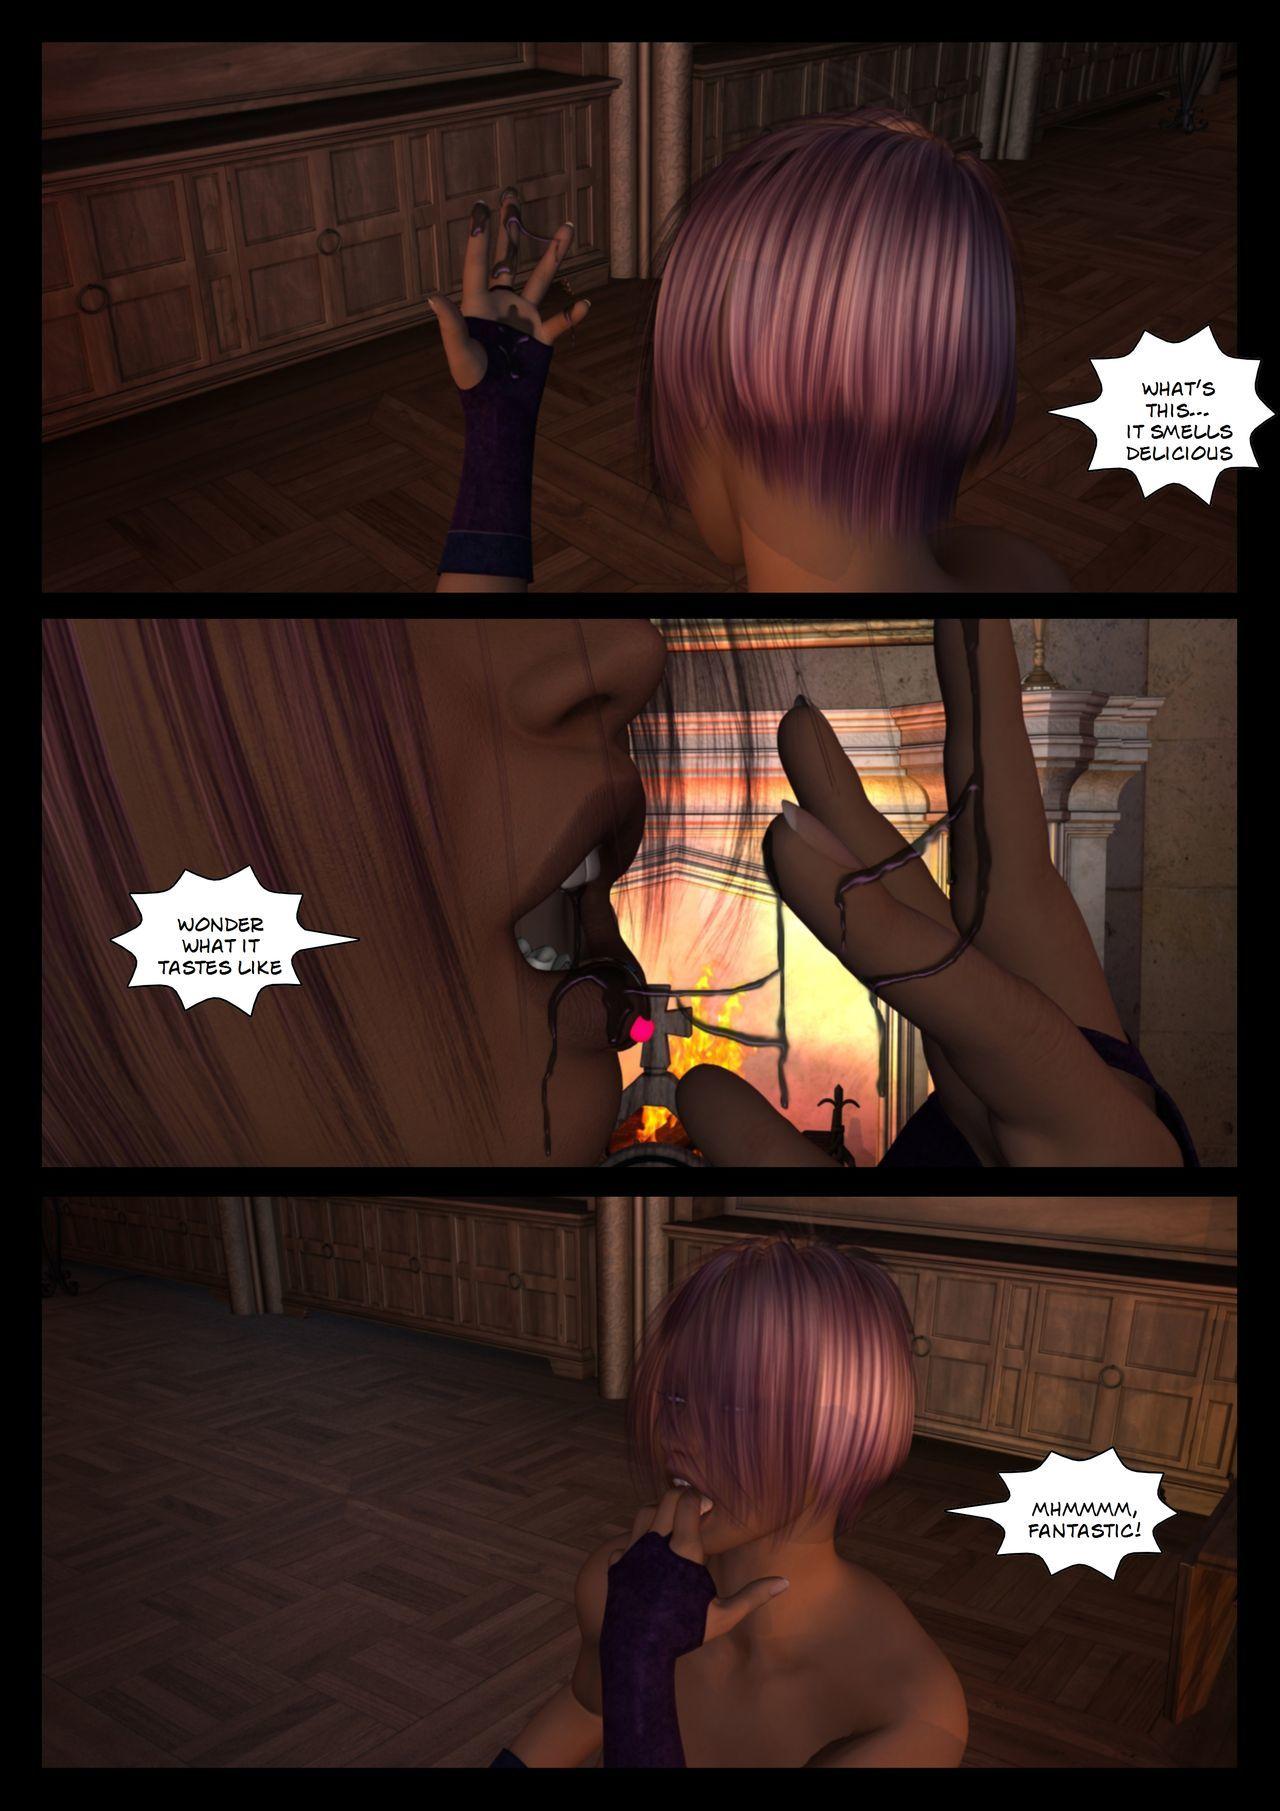 [Shinra-kun] Legion: Thrall of the Mask - Part 1 - part 4